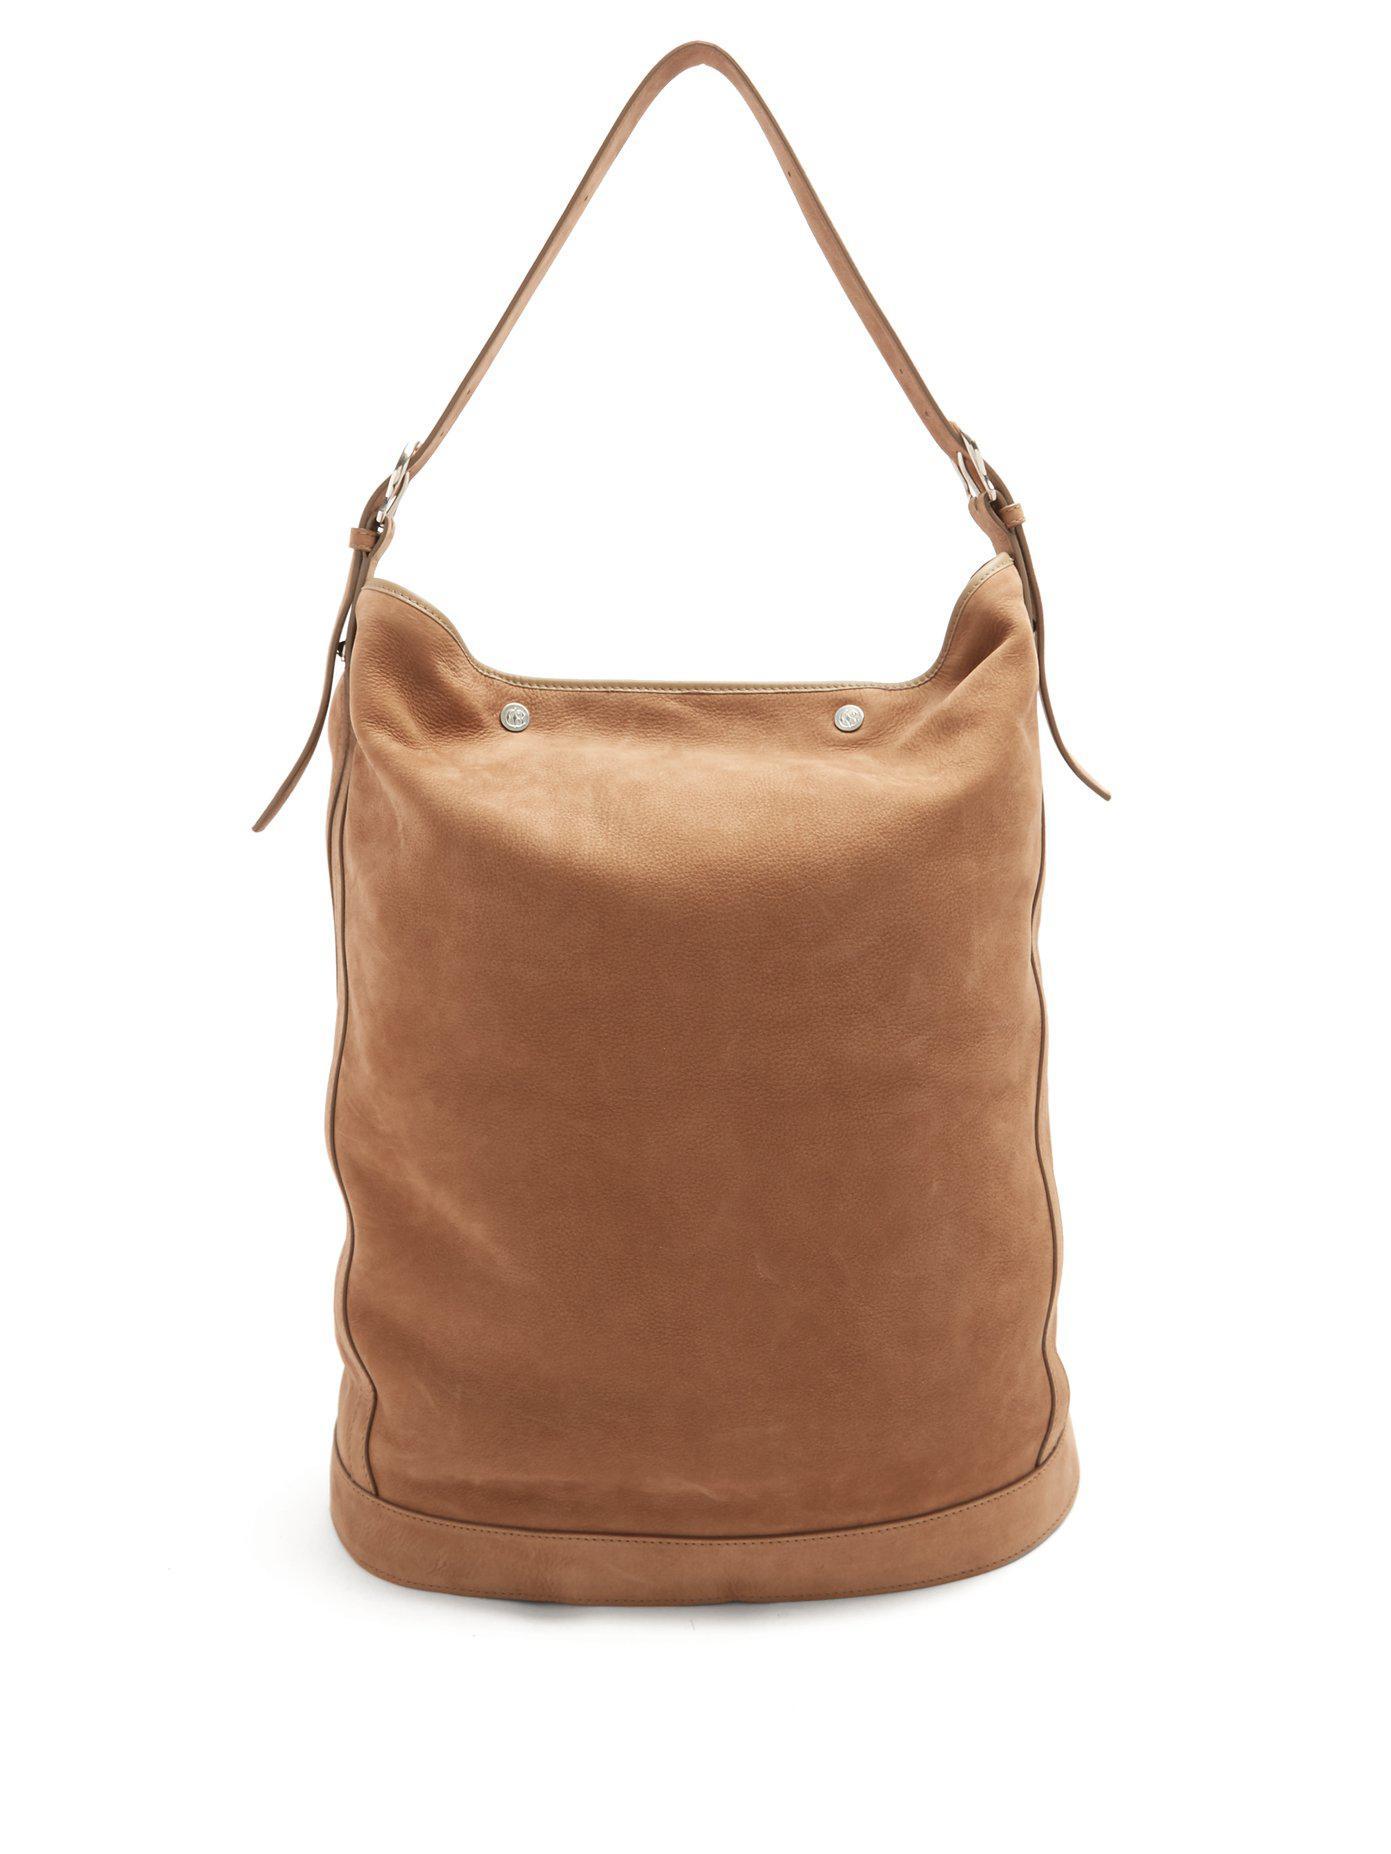 1922 leather bucket bag CONNOLLY 3tcNUCRKU